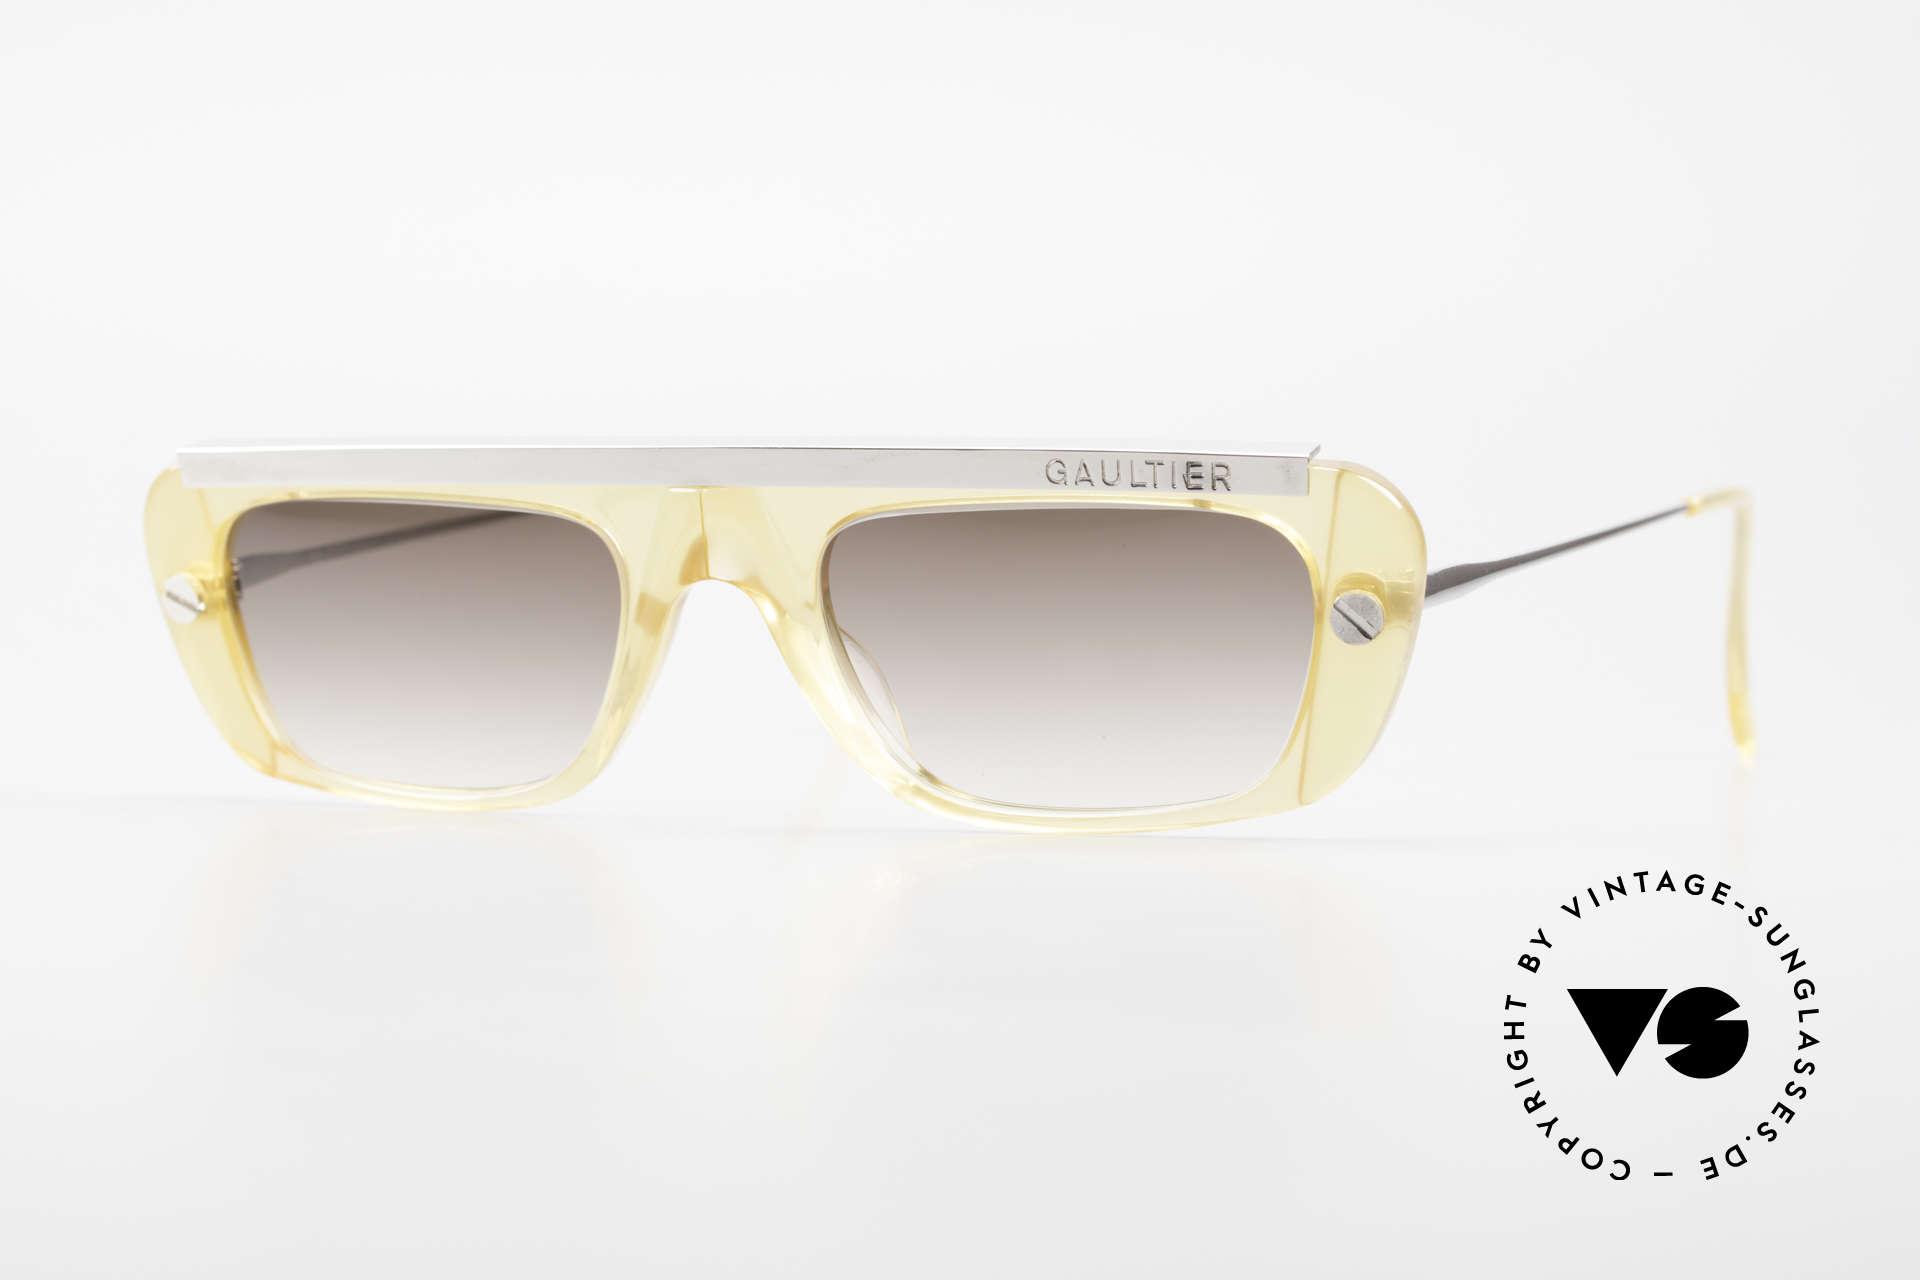 Jean Paul Gaultier 55-0771 Striking Vintage JPG Shades, striking Jean Paul GAULTIER vintage sunglasses, Made for Men and Women